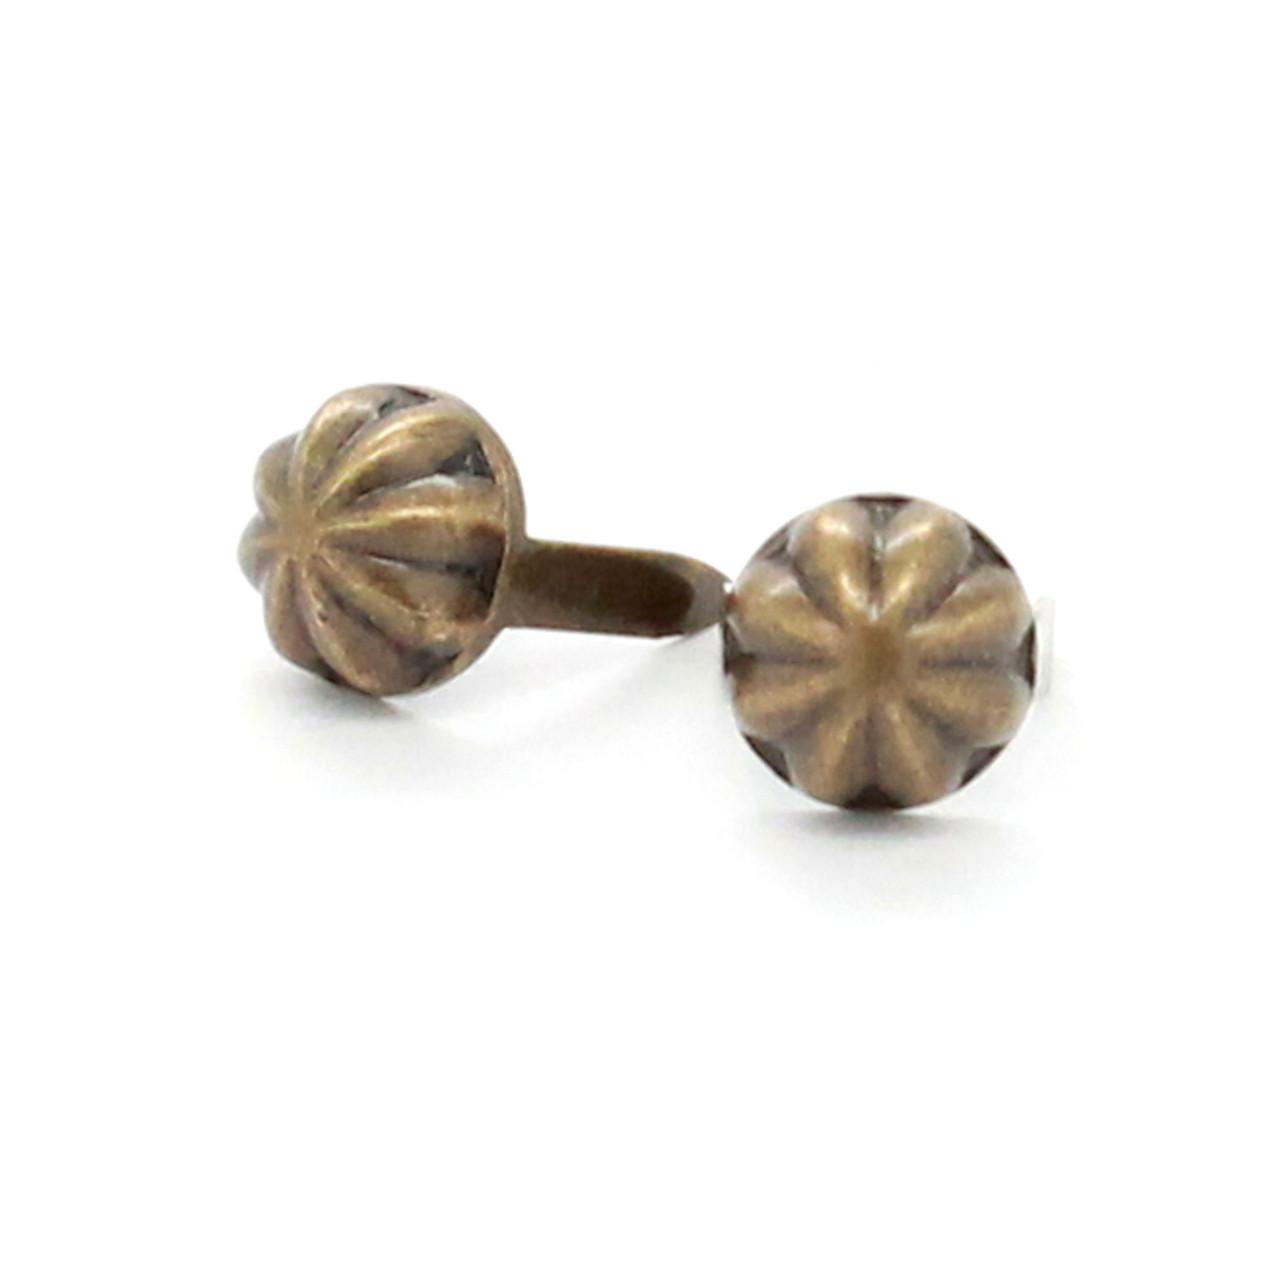 "Parachute Nail Head Spots Antique Brass 1/4"""